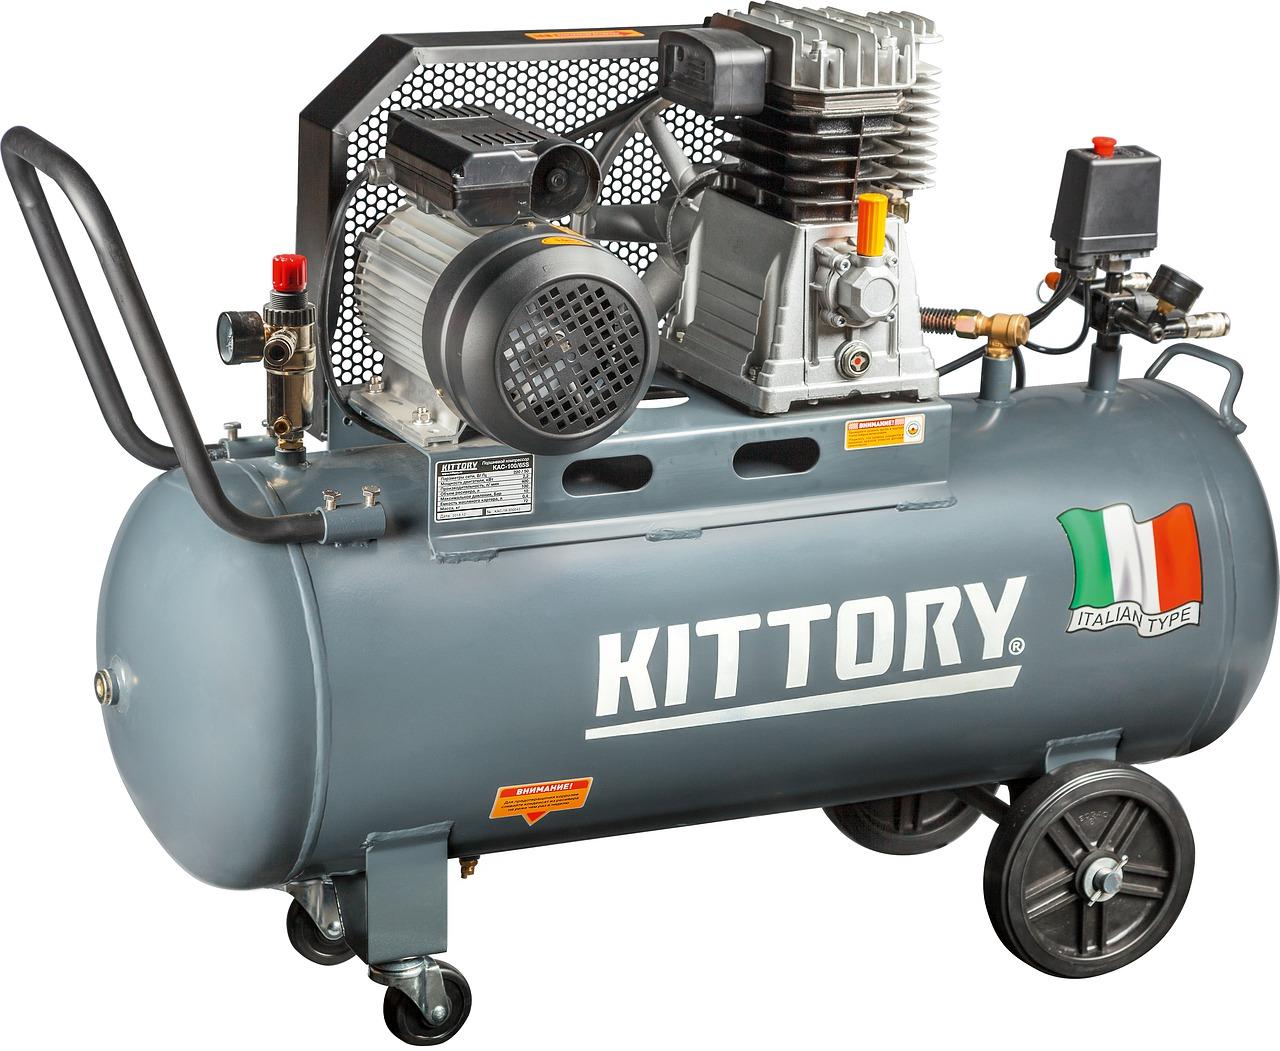 compressor-4784330_1280